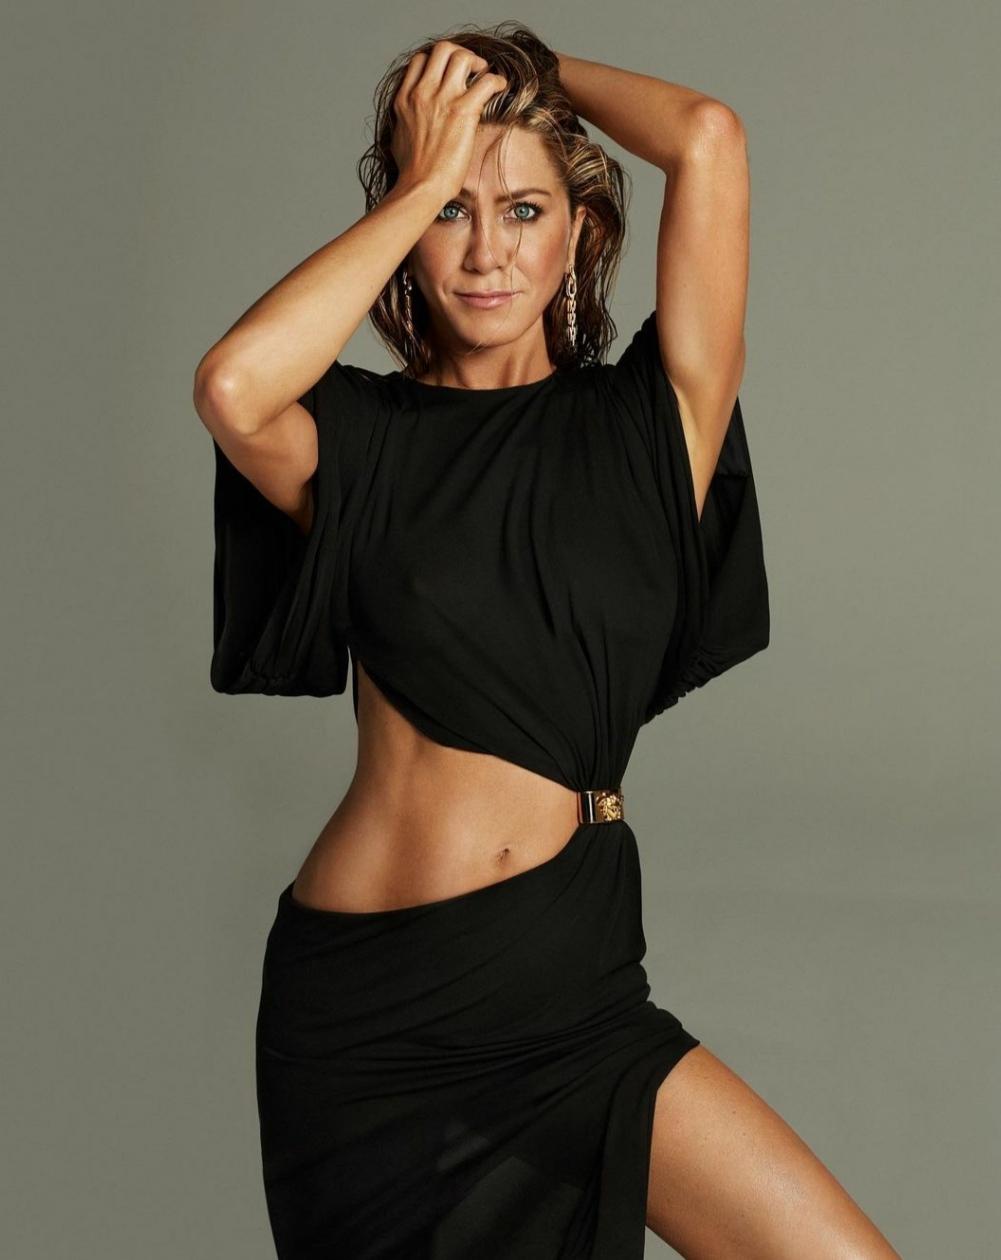 LolaVie Όλα όσα γνωρίζουμε για το beauty brand της Jennifer Aniston